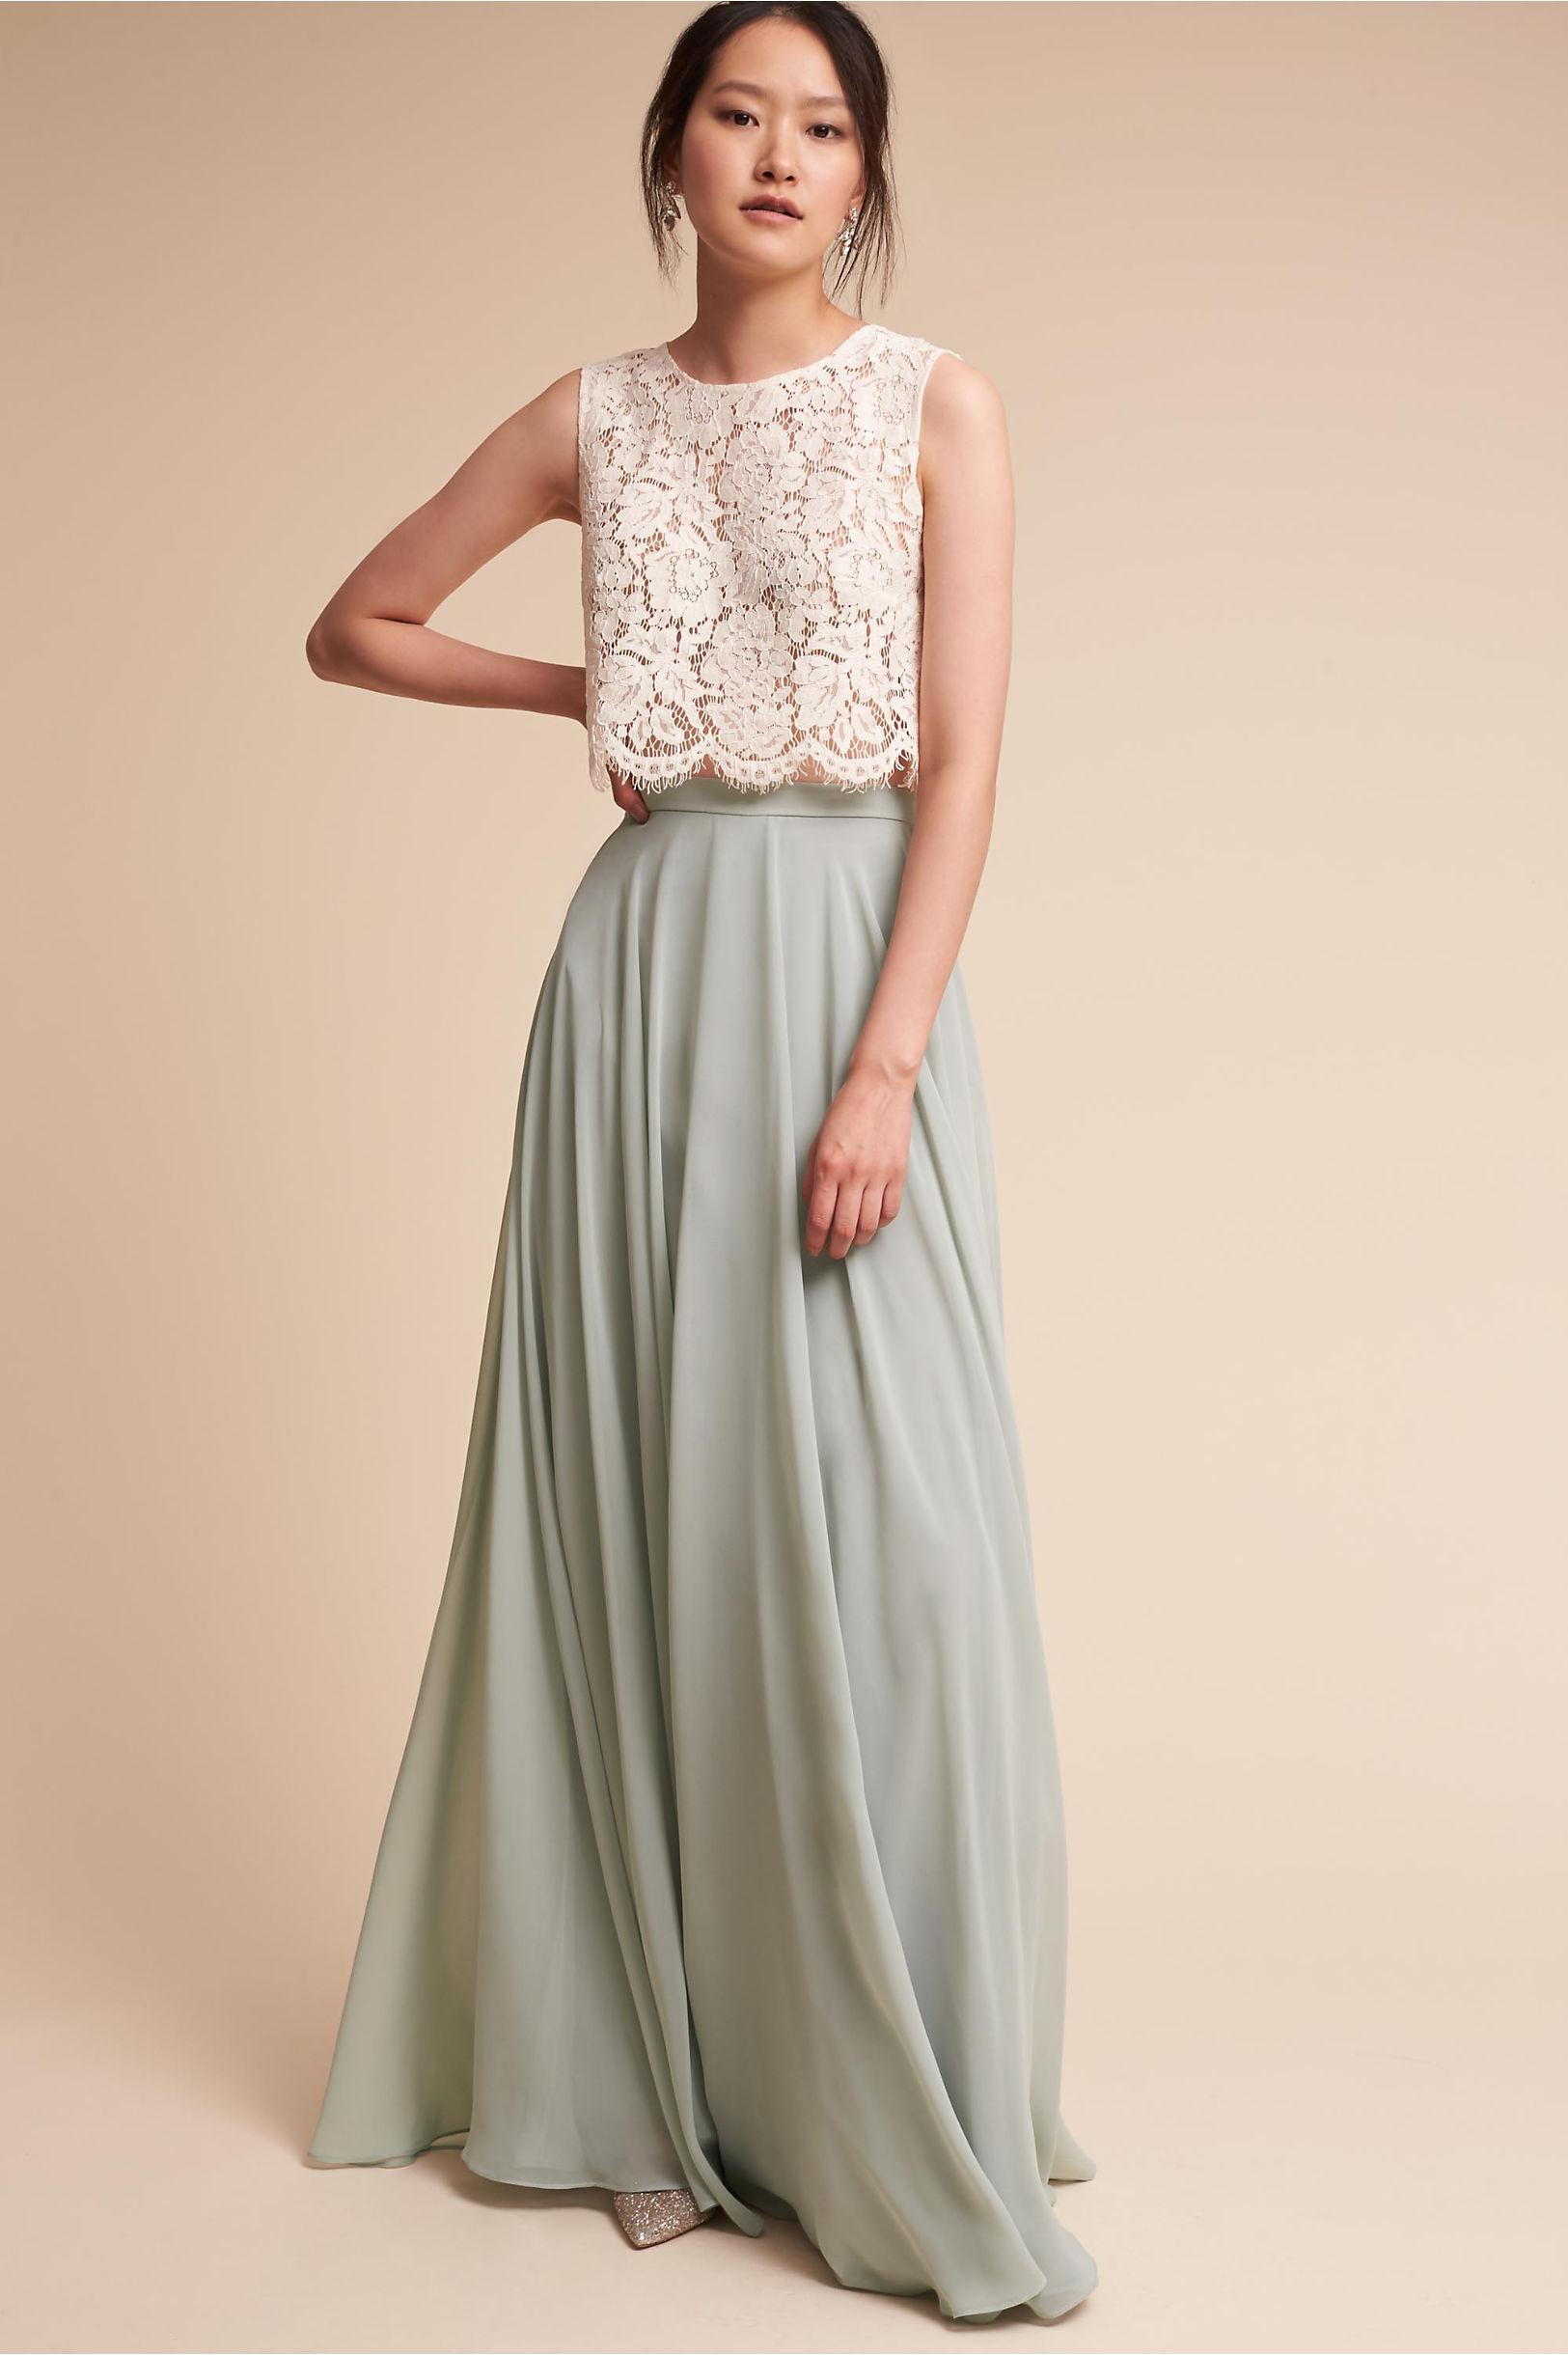 Lace bridesmaid dresses long short styles bhldn cleo top hampton skirt ombrellifo Images